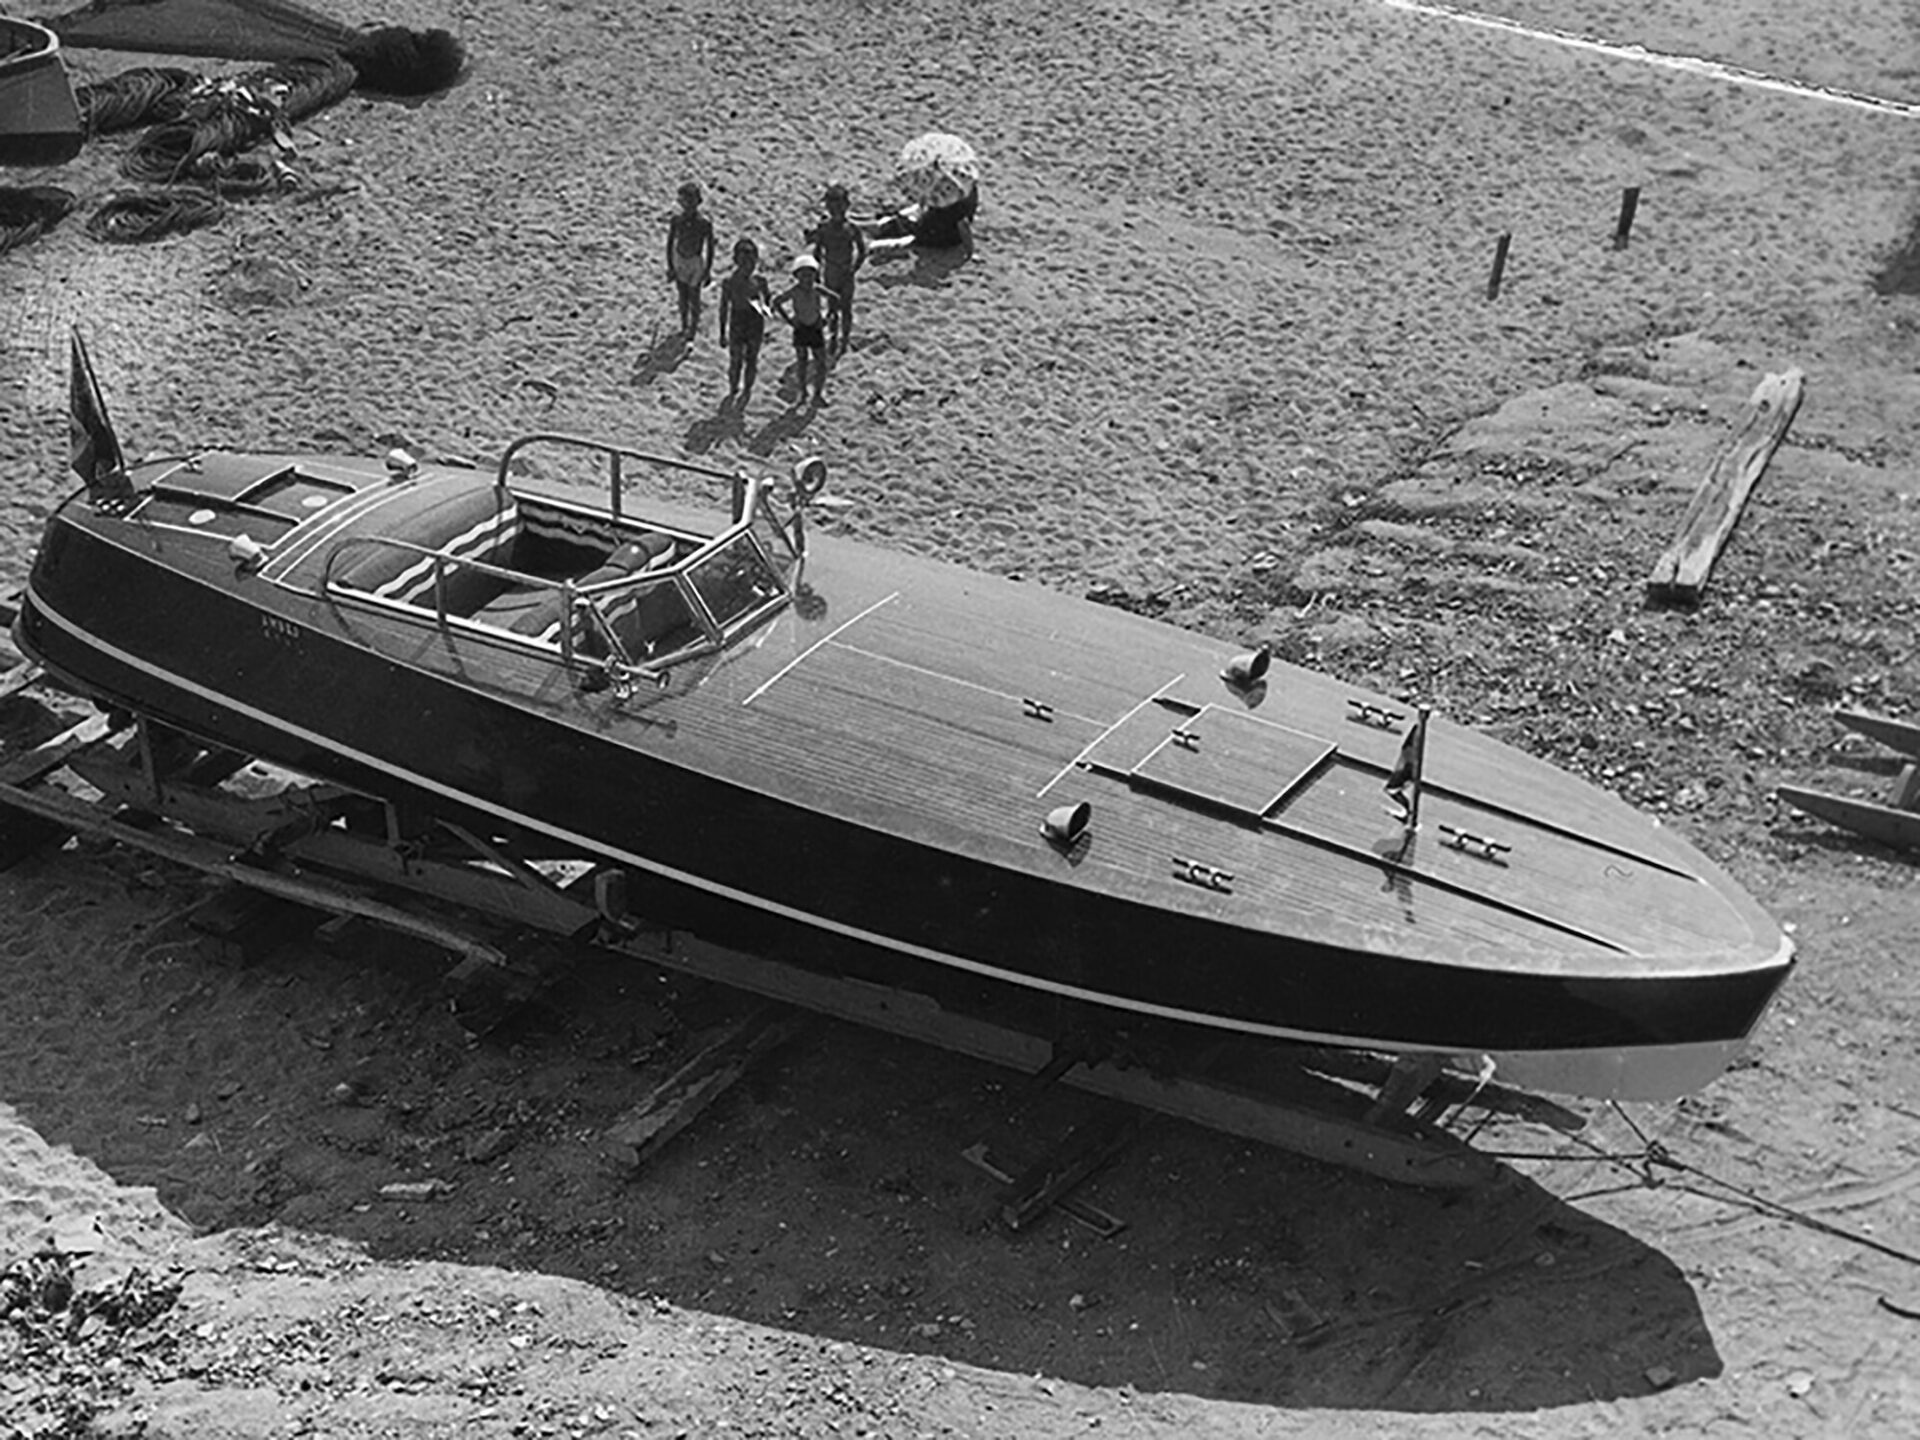 1933 - Ambro, motoscafo